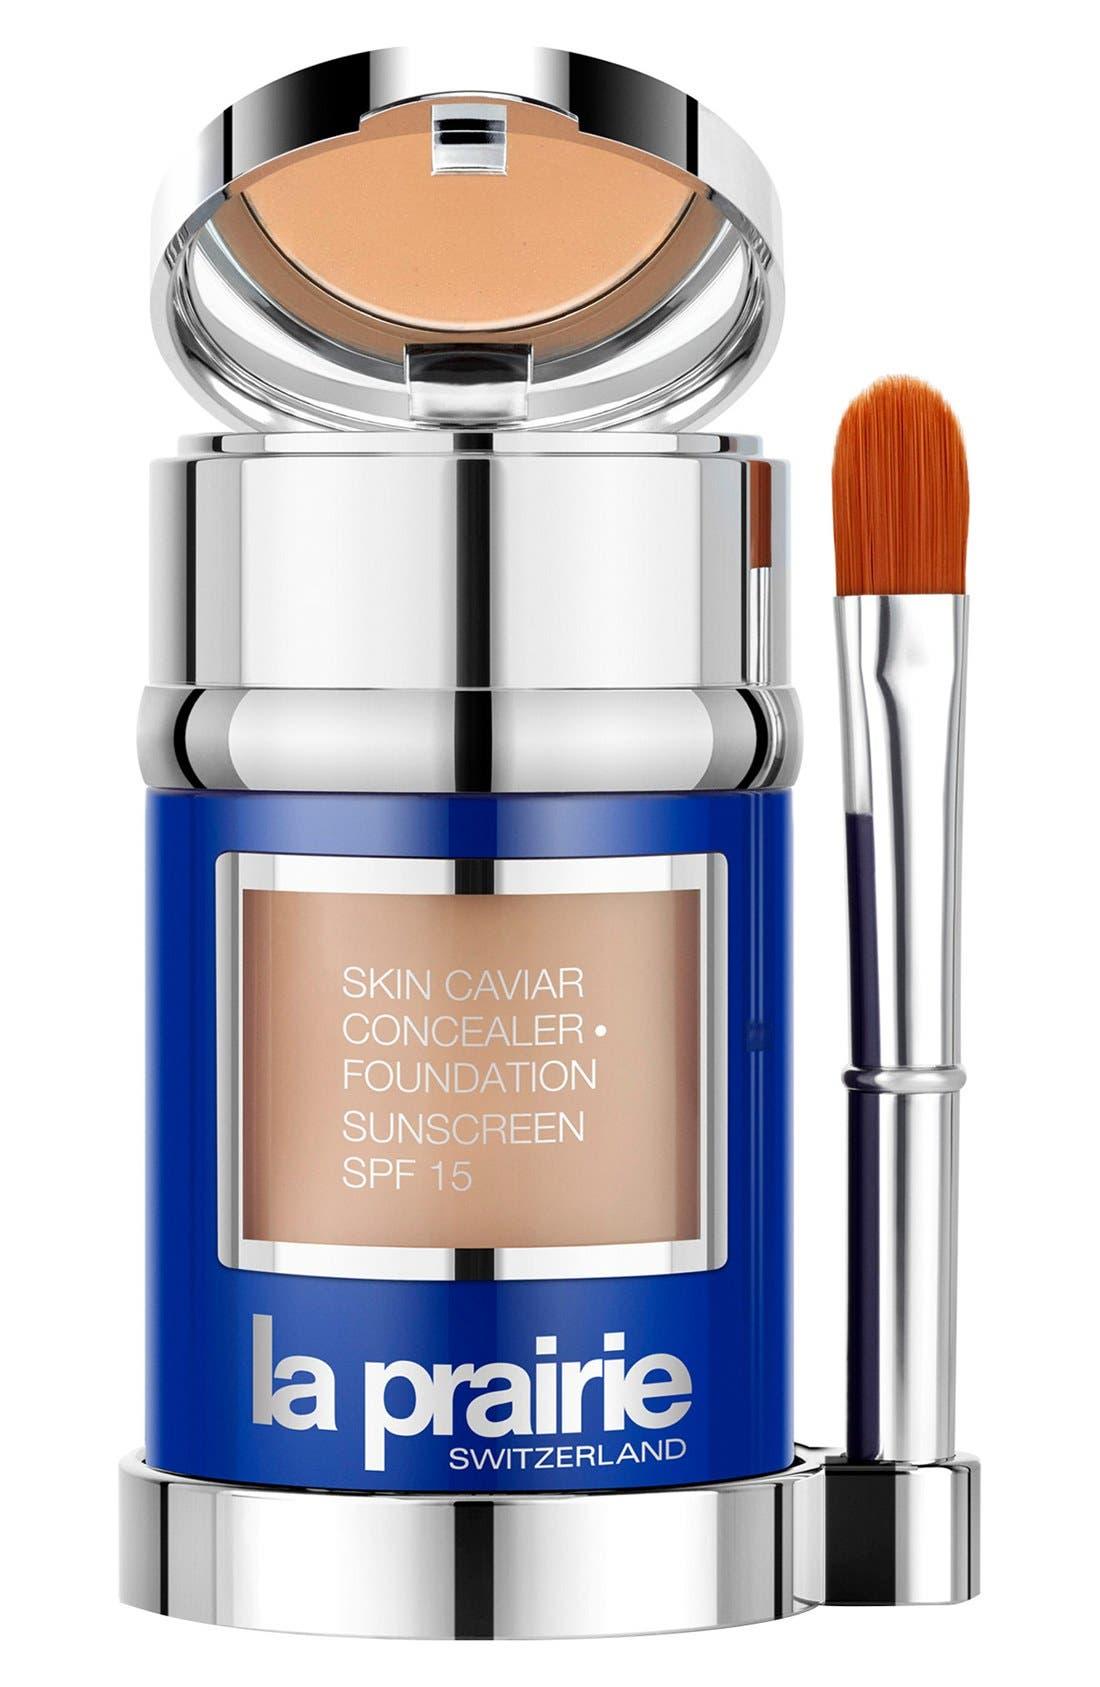 Skin Caviar Concealer + Foundation Sunscreen SPF 15,                             Alternate thumbnail 4, color,                             WARM BEIGE